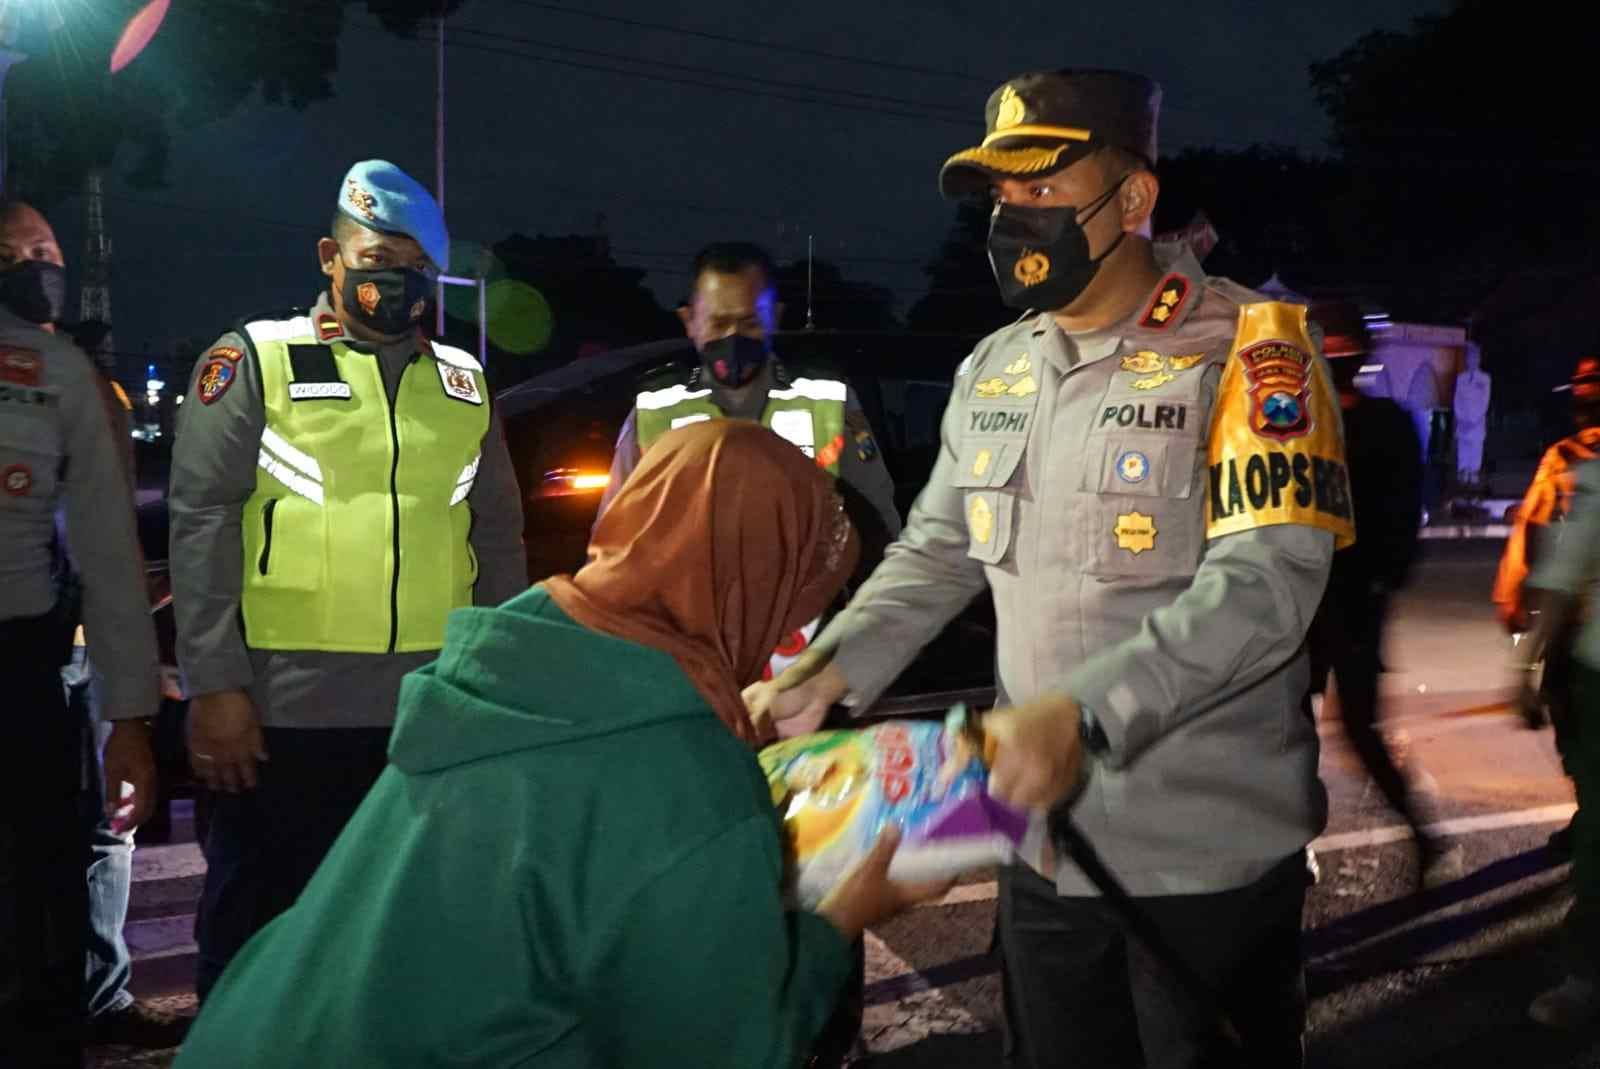 Polres Blitar Kota Patroli Skala Besar